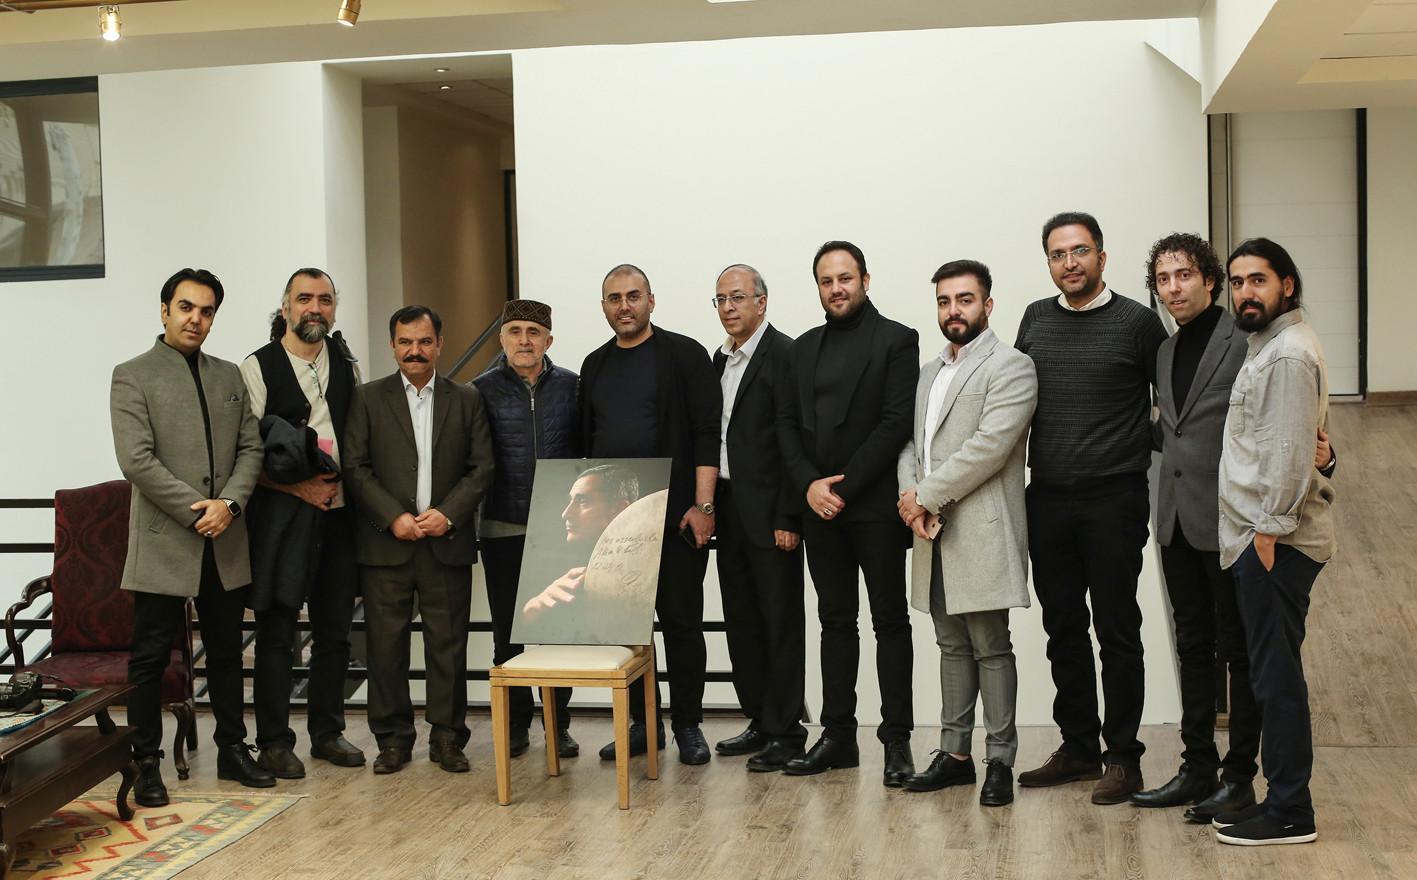 TEHRAN NATIONAL MUSIC MUSEUM alim qasimov Photo donnation seven beauties projects 2018